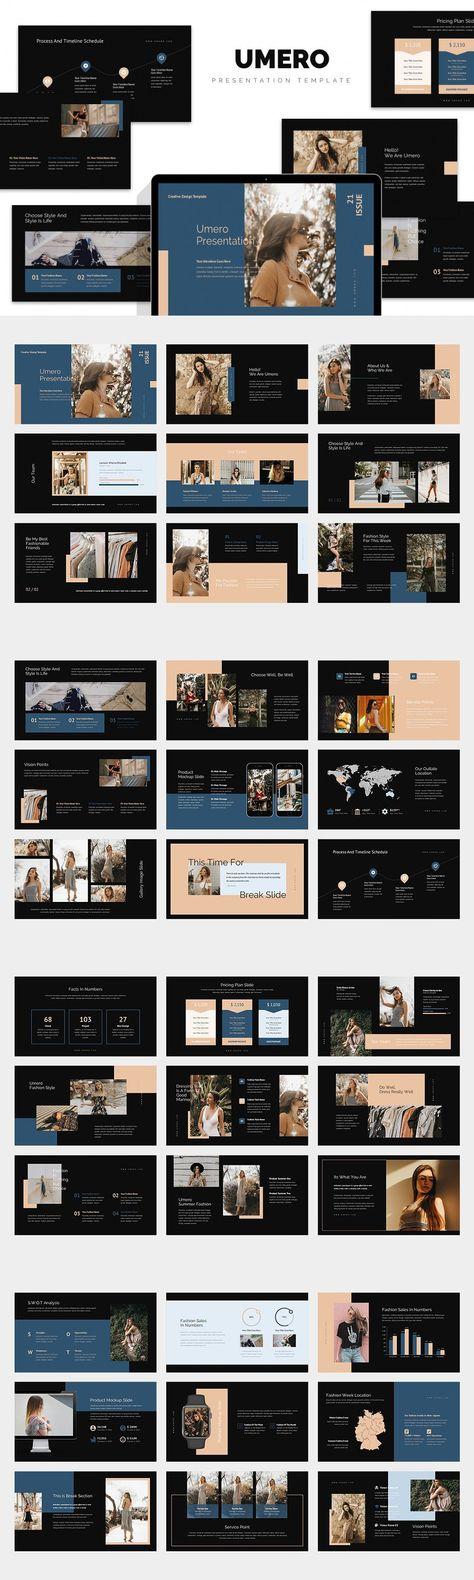 Umero : Fashion Agency Powerpoint